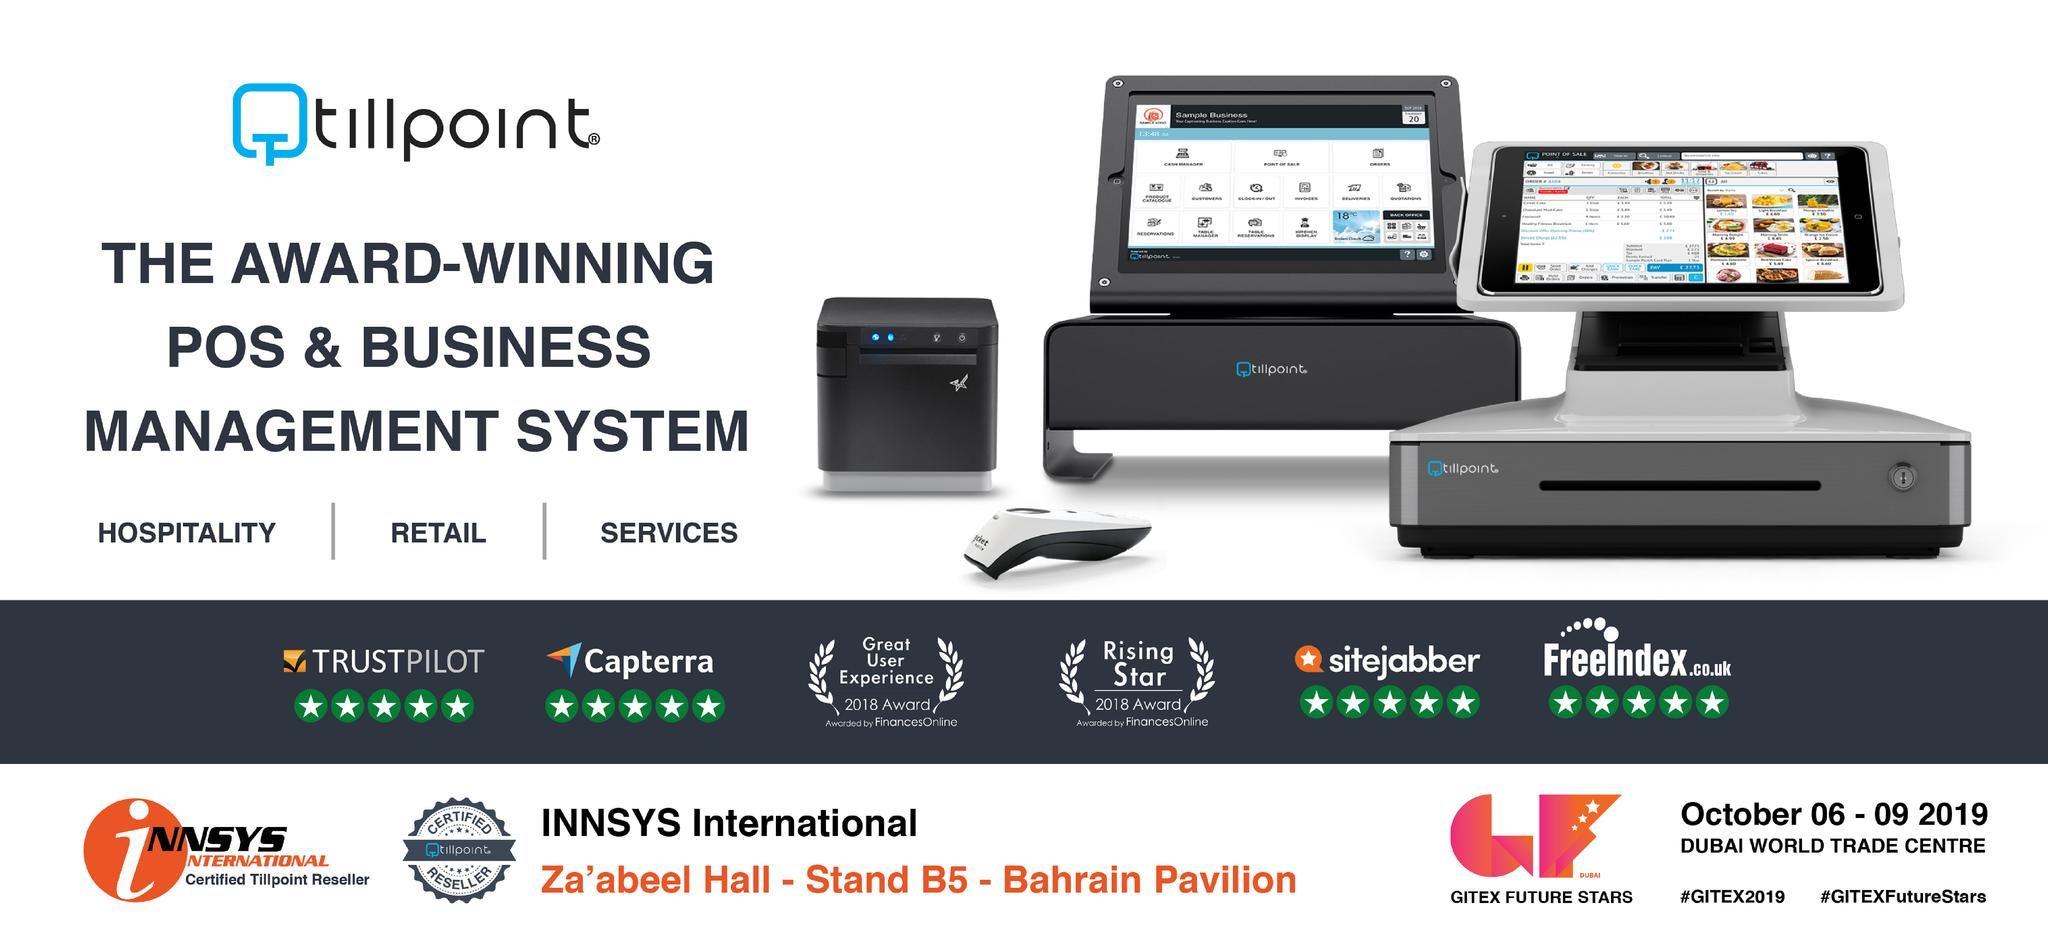 Innsys International